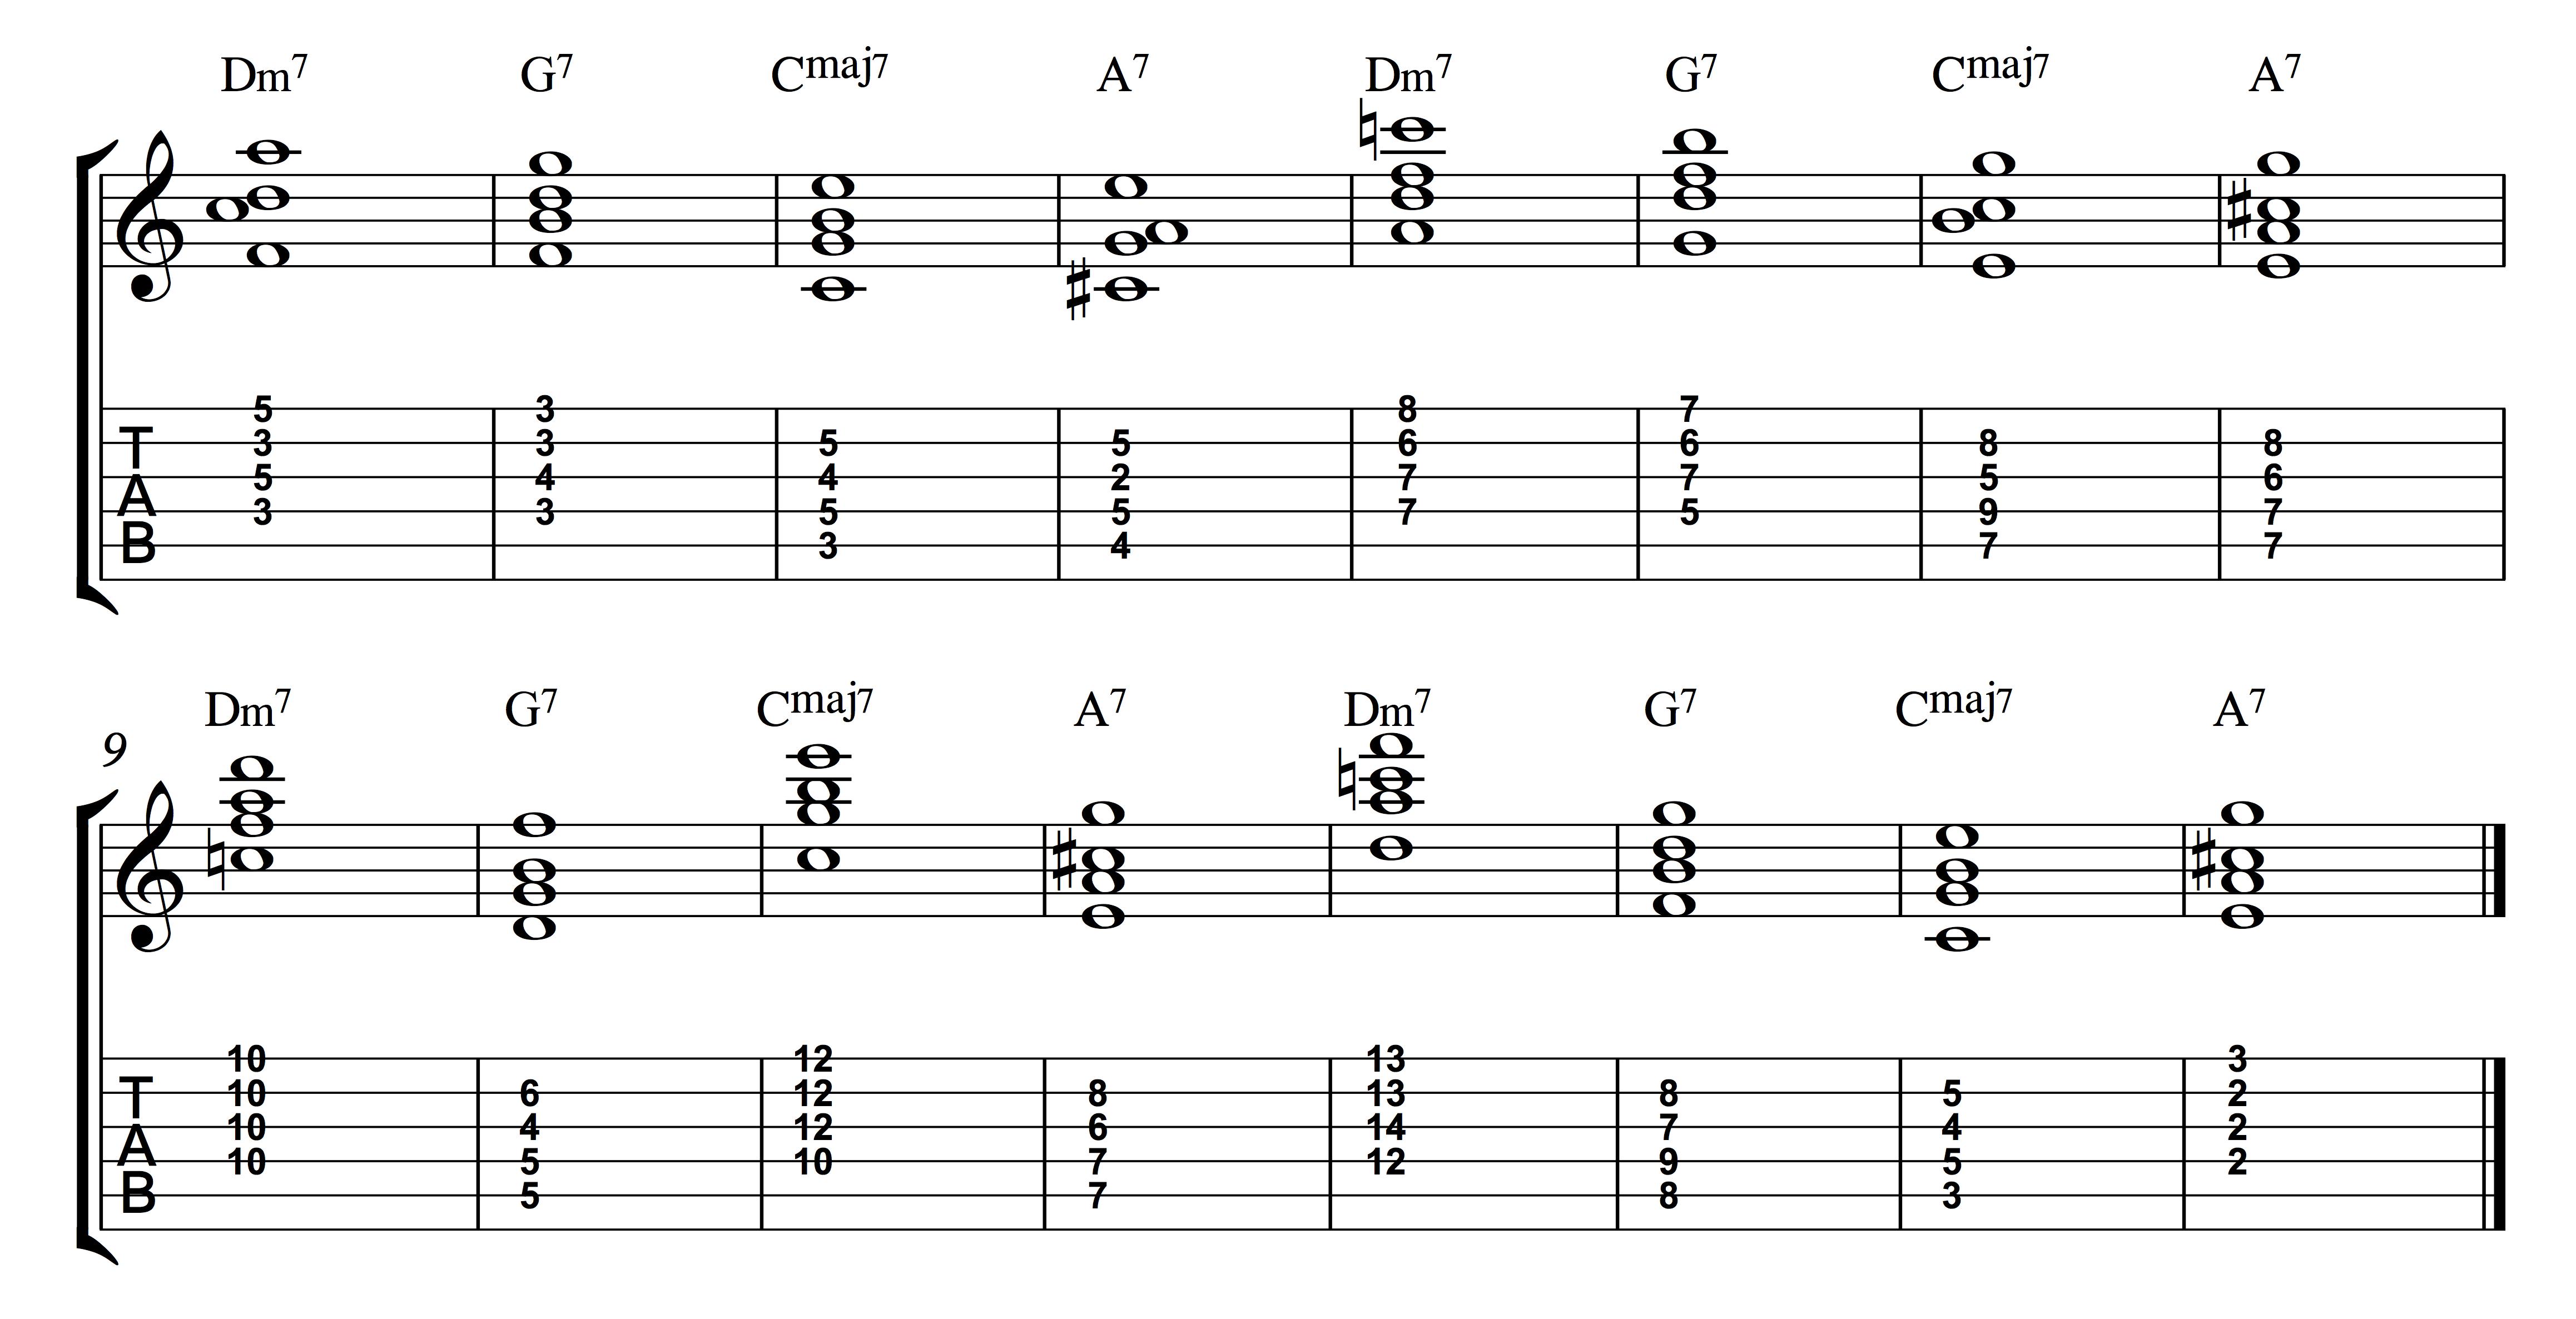 Chord Progression Practice 2 String Sets Dm7 G7 Cmaj7 A7 1000